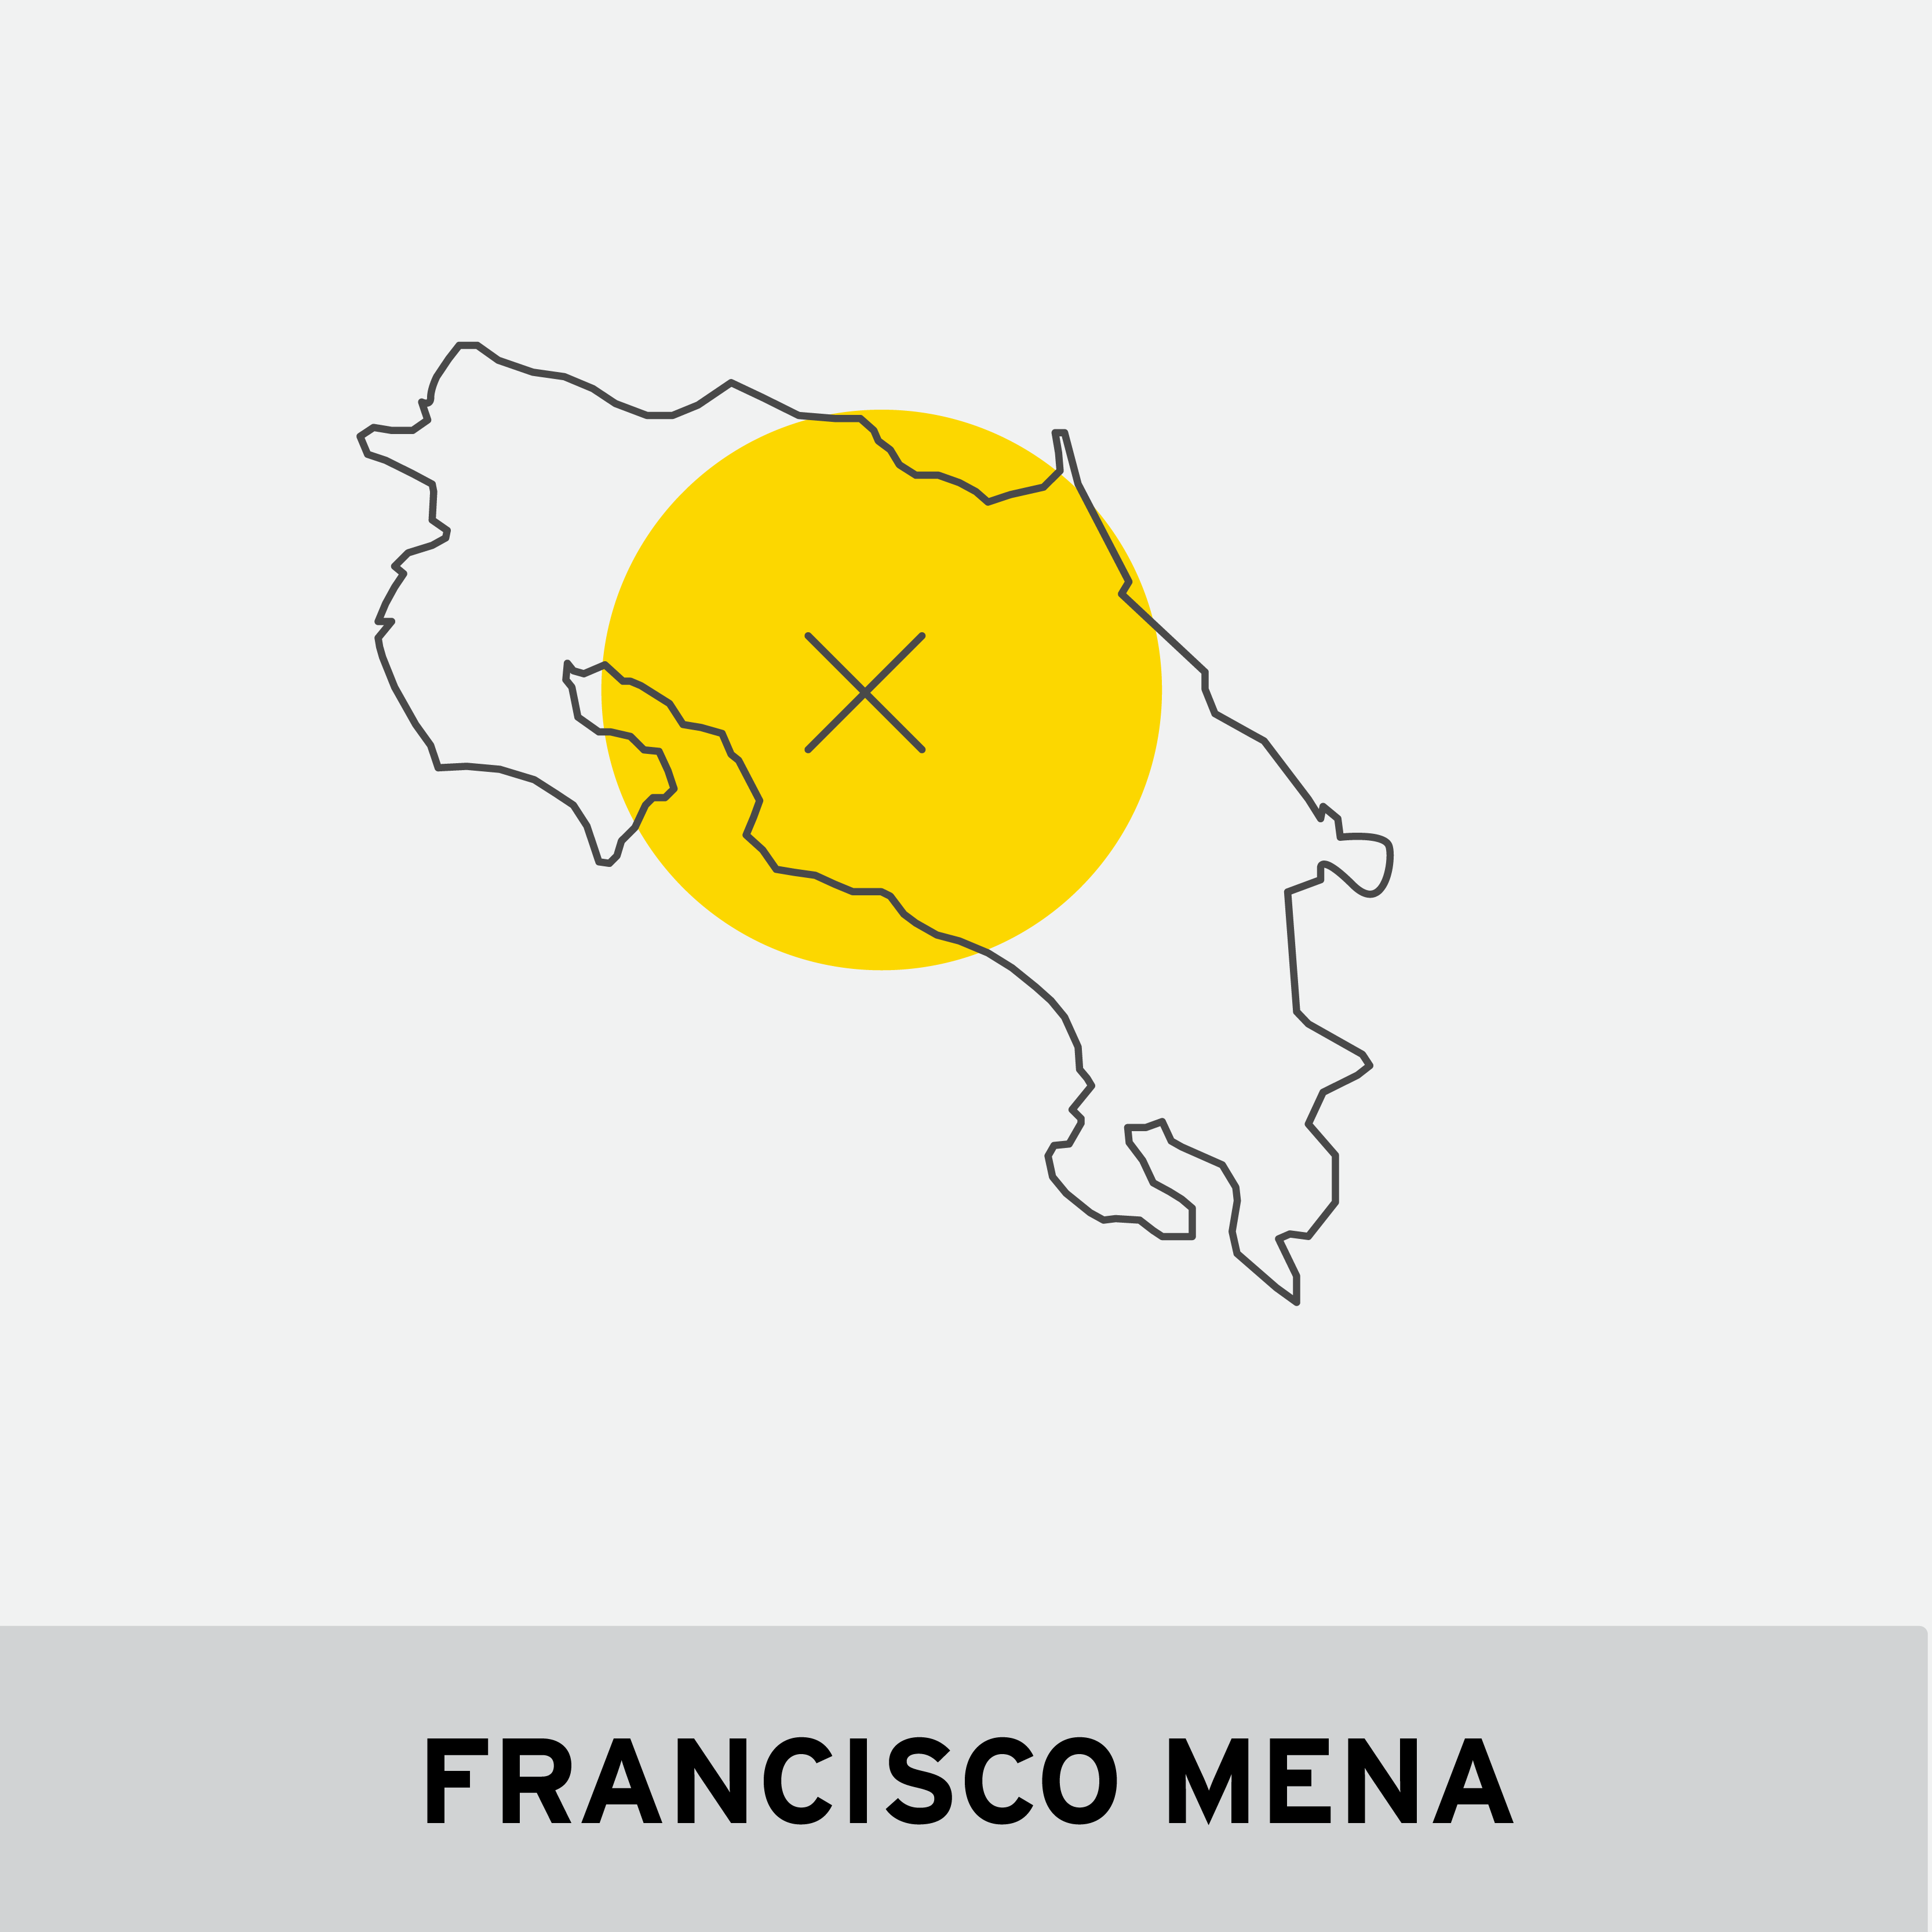 FRANCISCO MENA – SUMAVA DE LOURDES